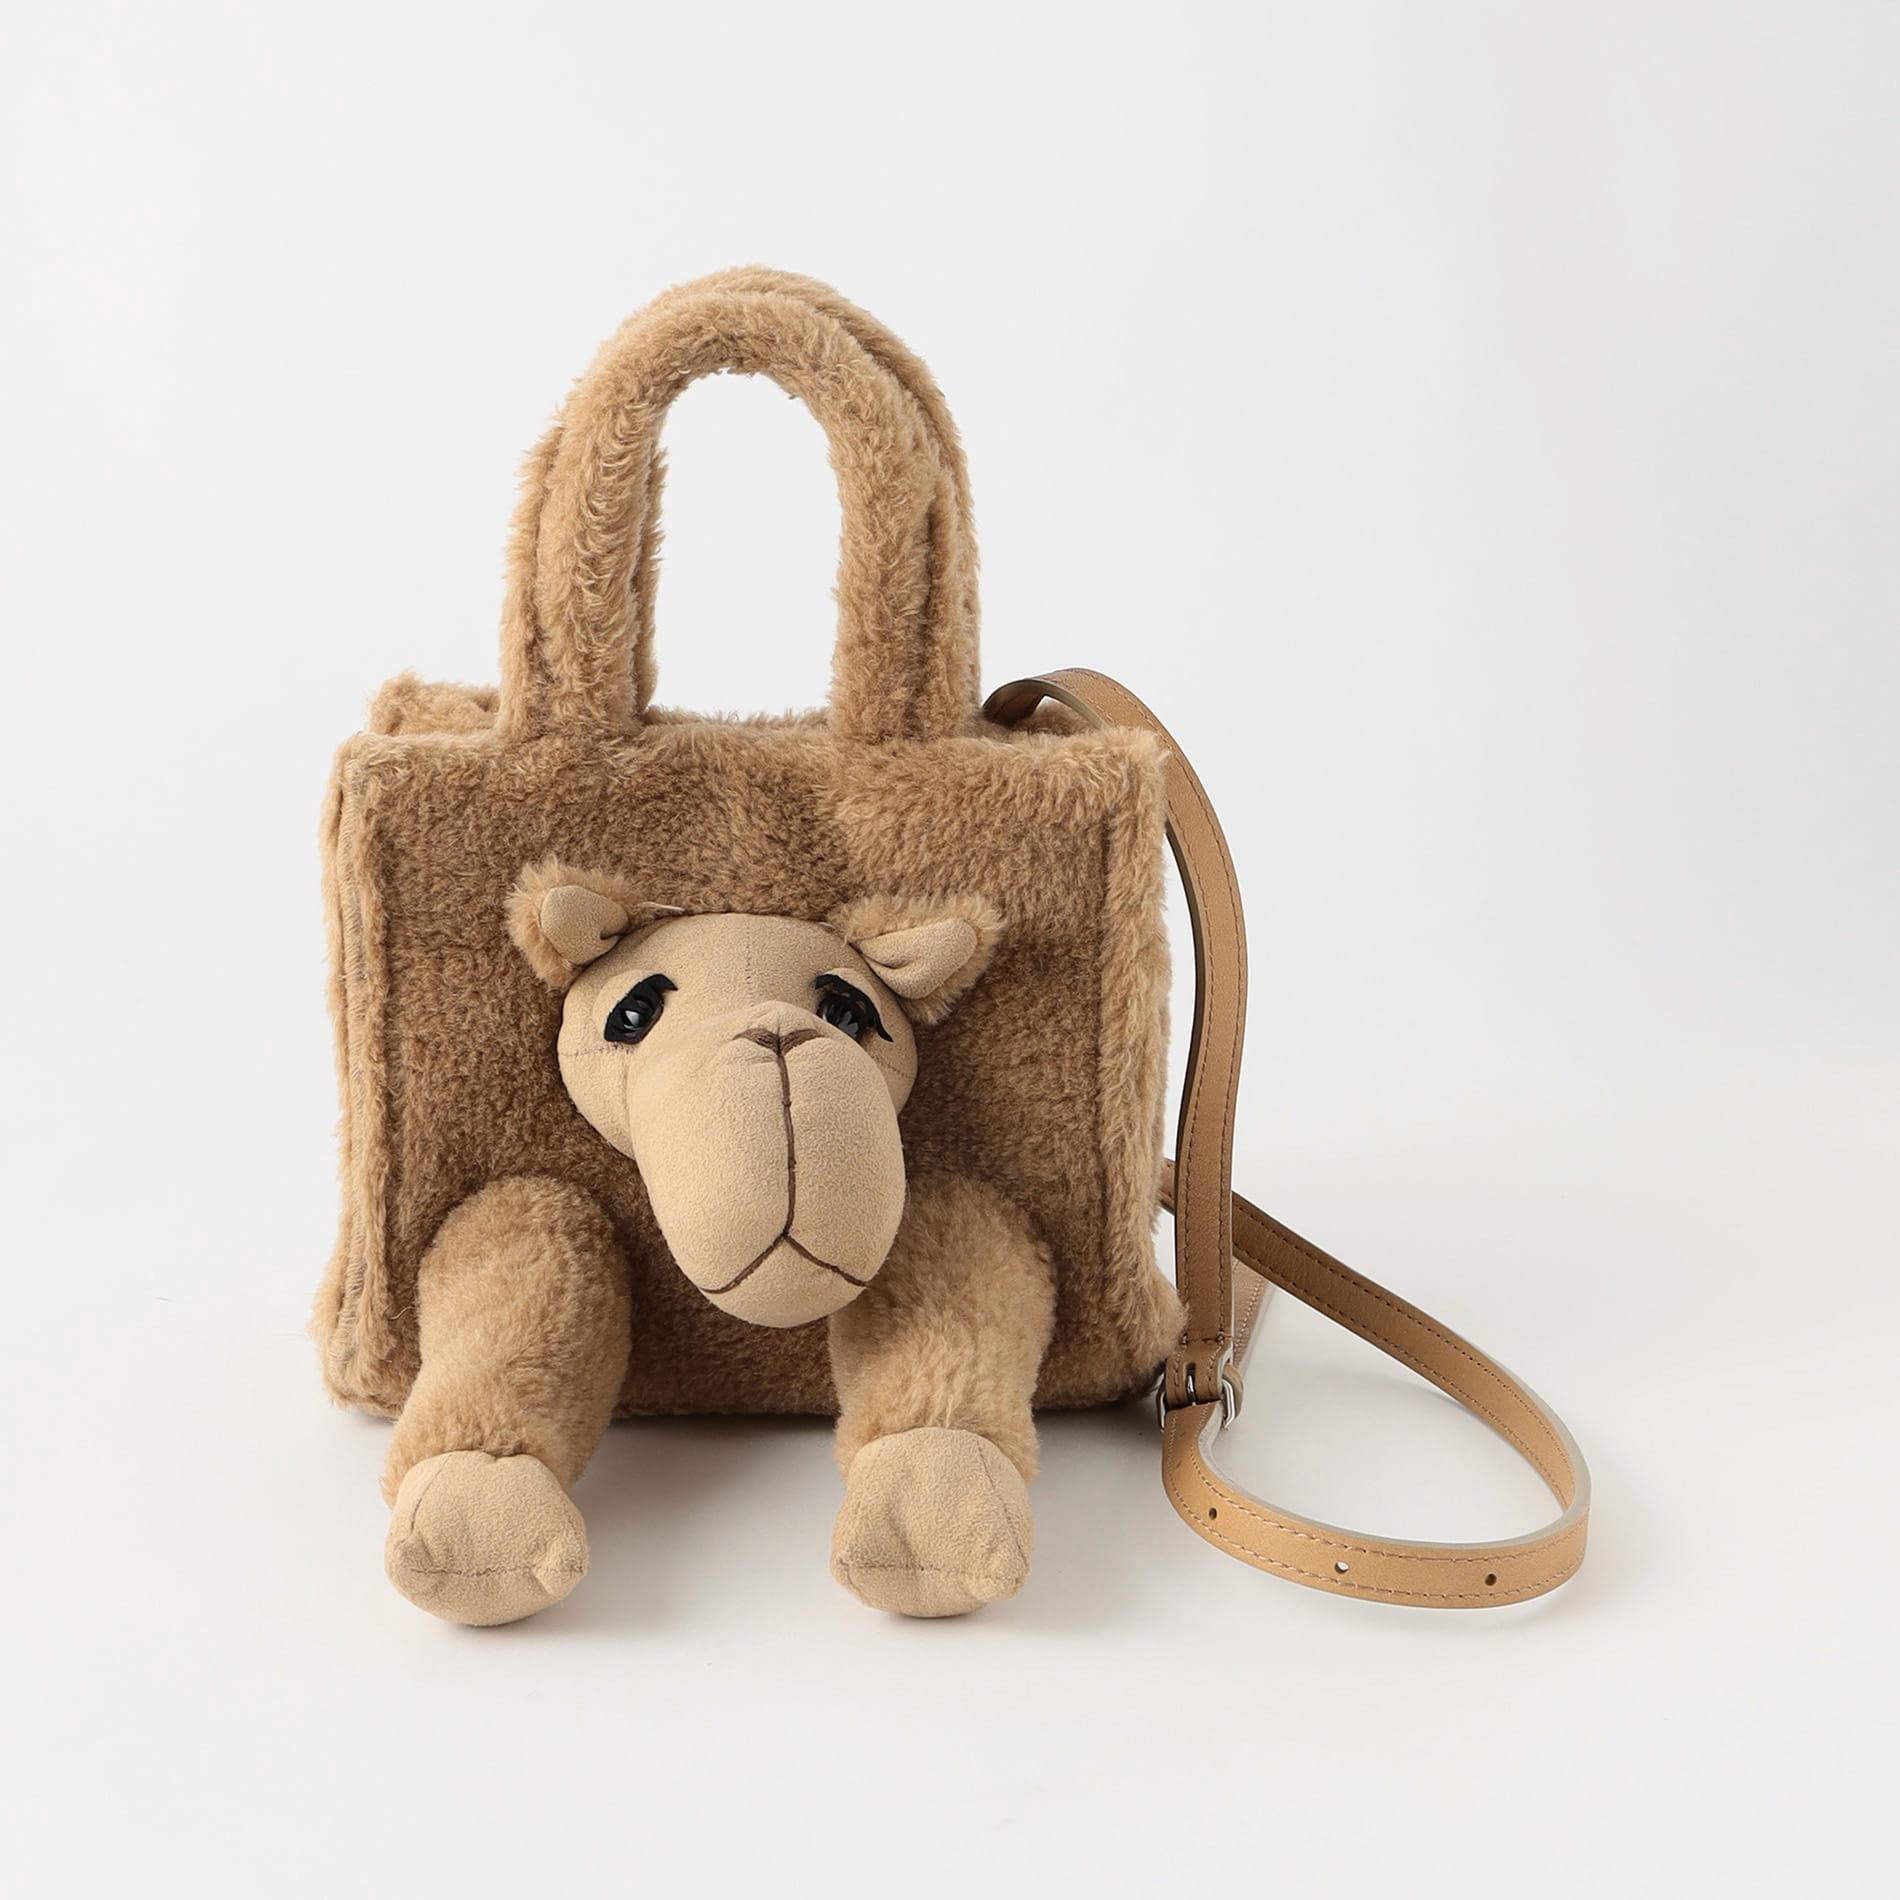 【doublet】MEN バッグ STUFFED ANIMAL FUR BAG 「S」 21AW05BG29